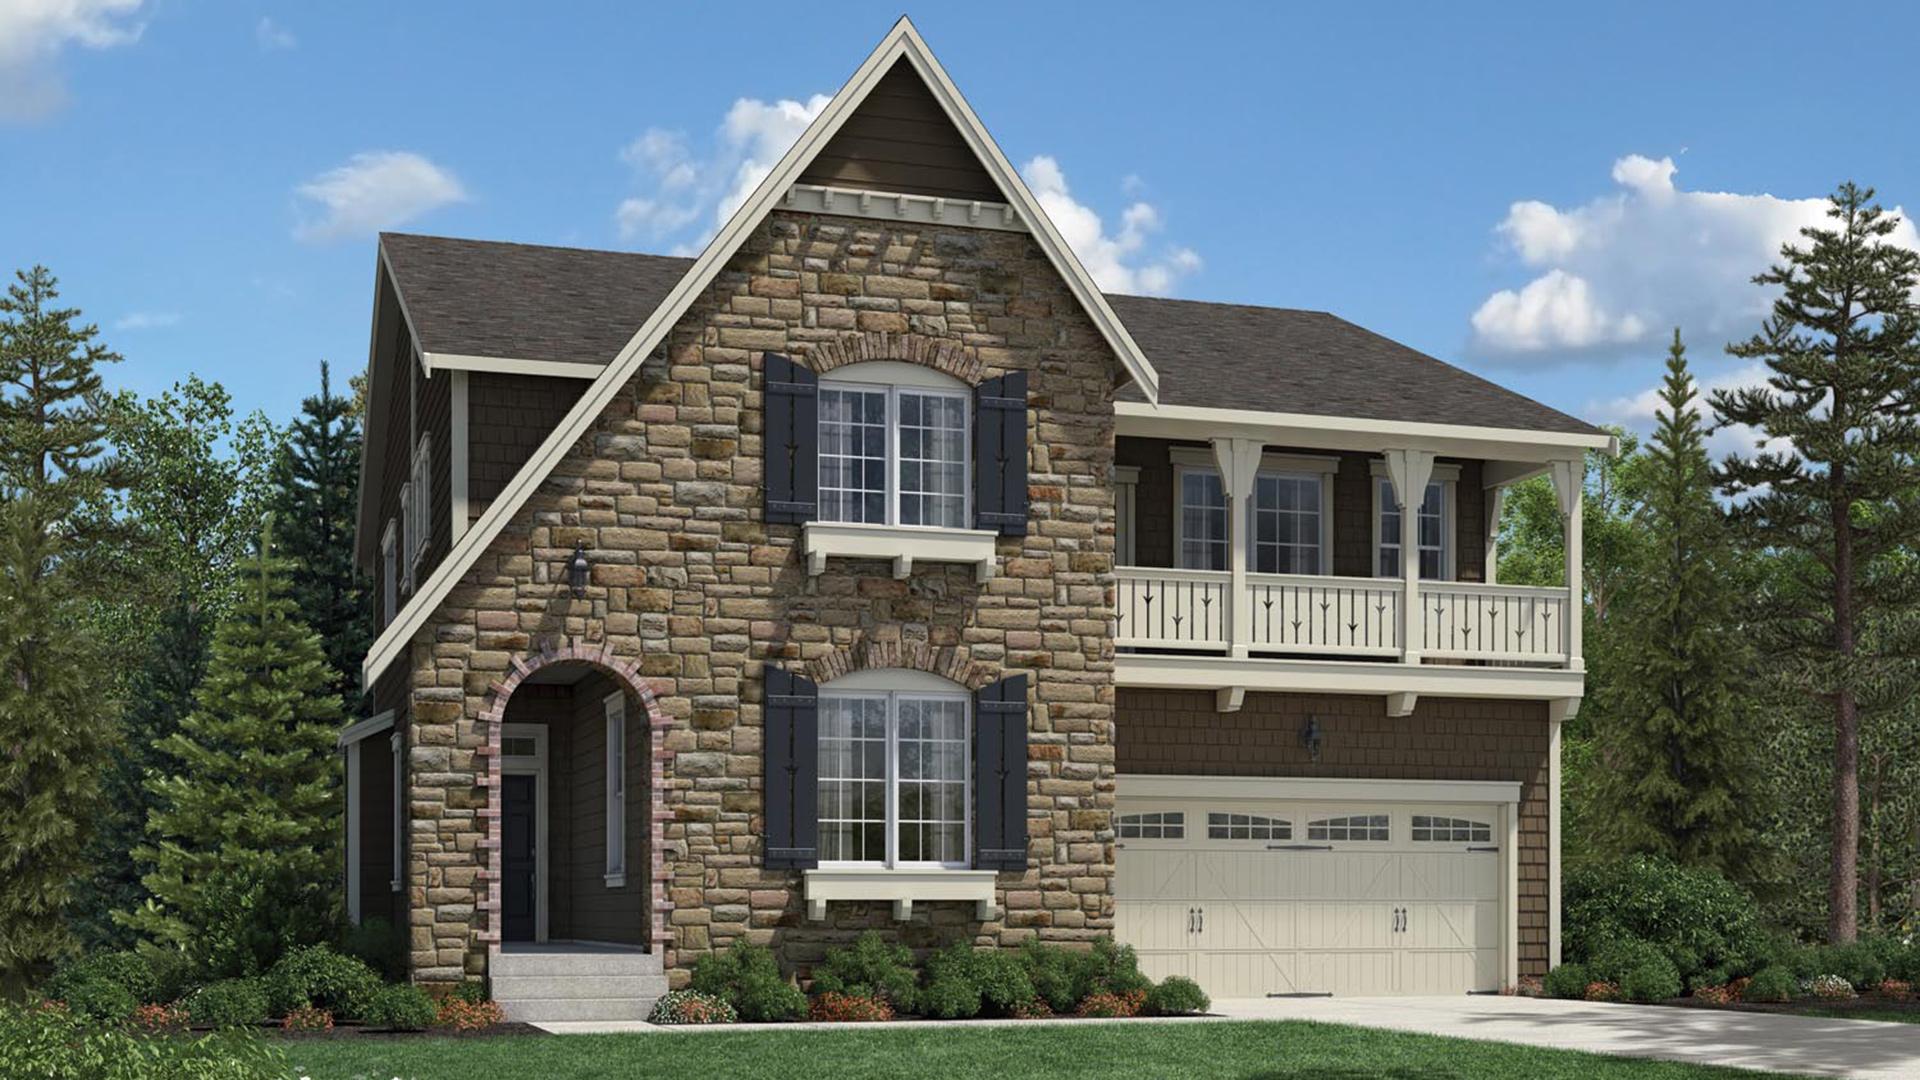 Cedarcroft The Ballard Home Design